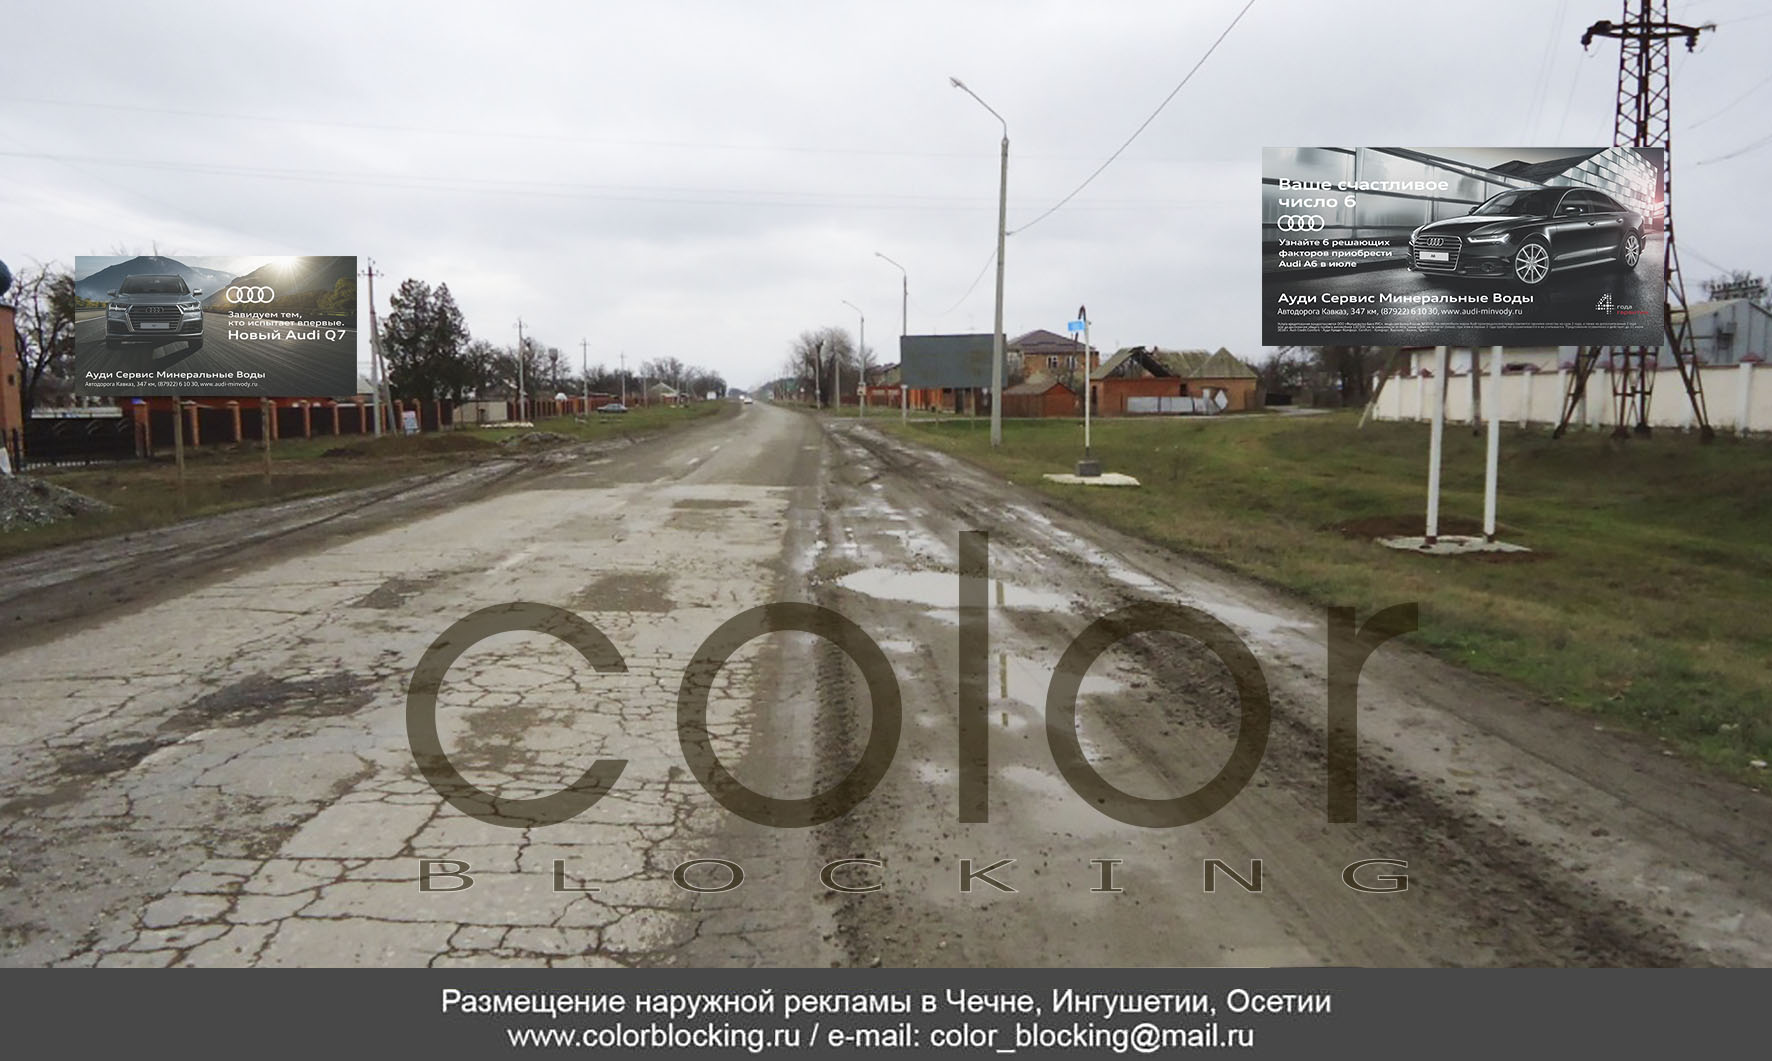 Наружная реклама в населенных пунктах Чечни Алпатово